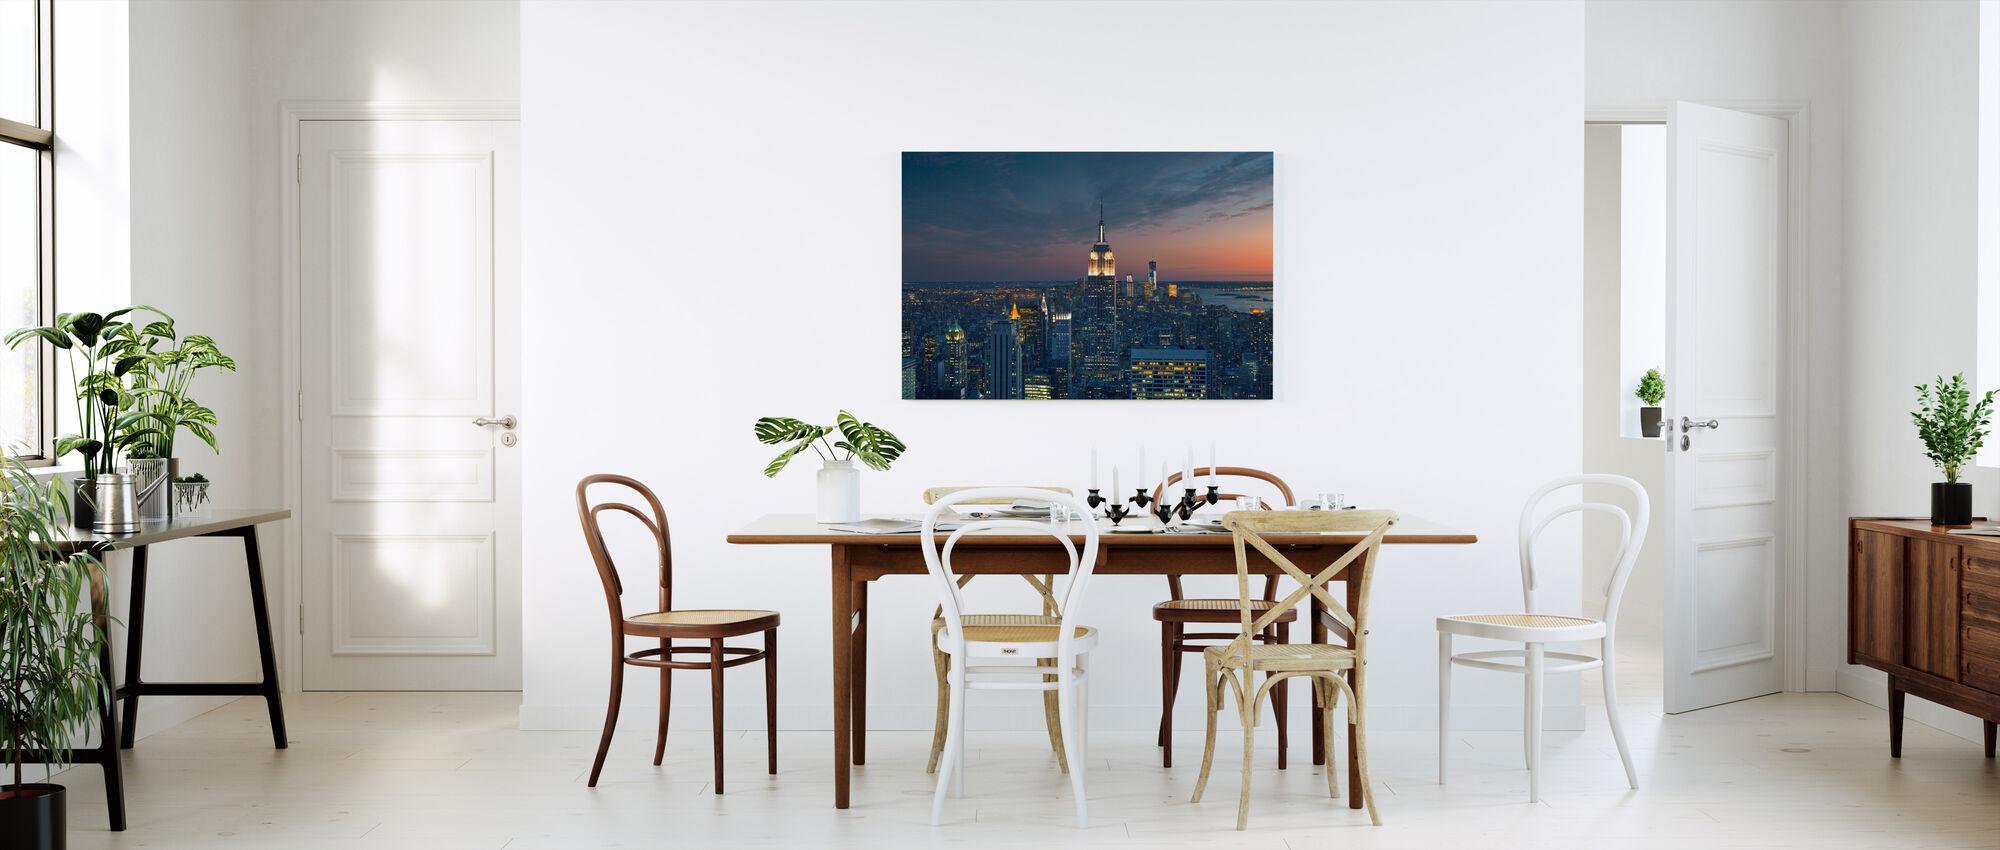 Luchtfoto van Manhattan bij zonsondergang - Canvas print - Keuken